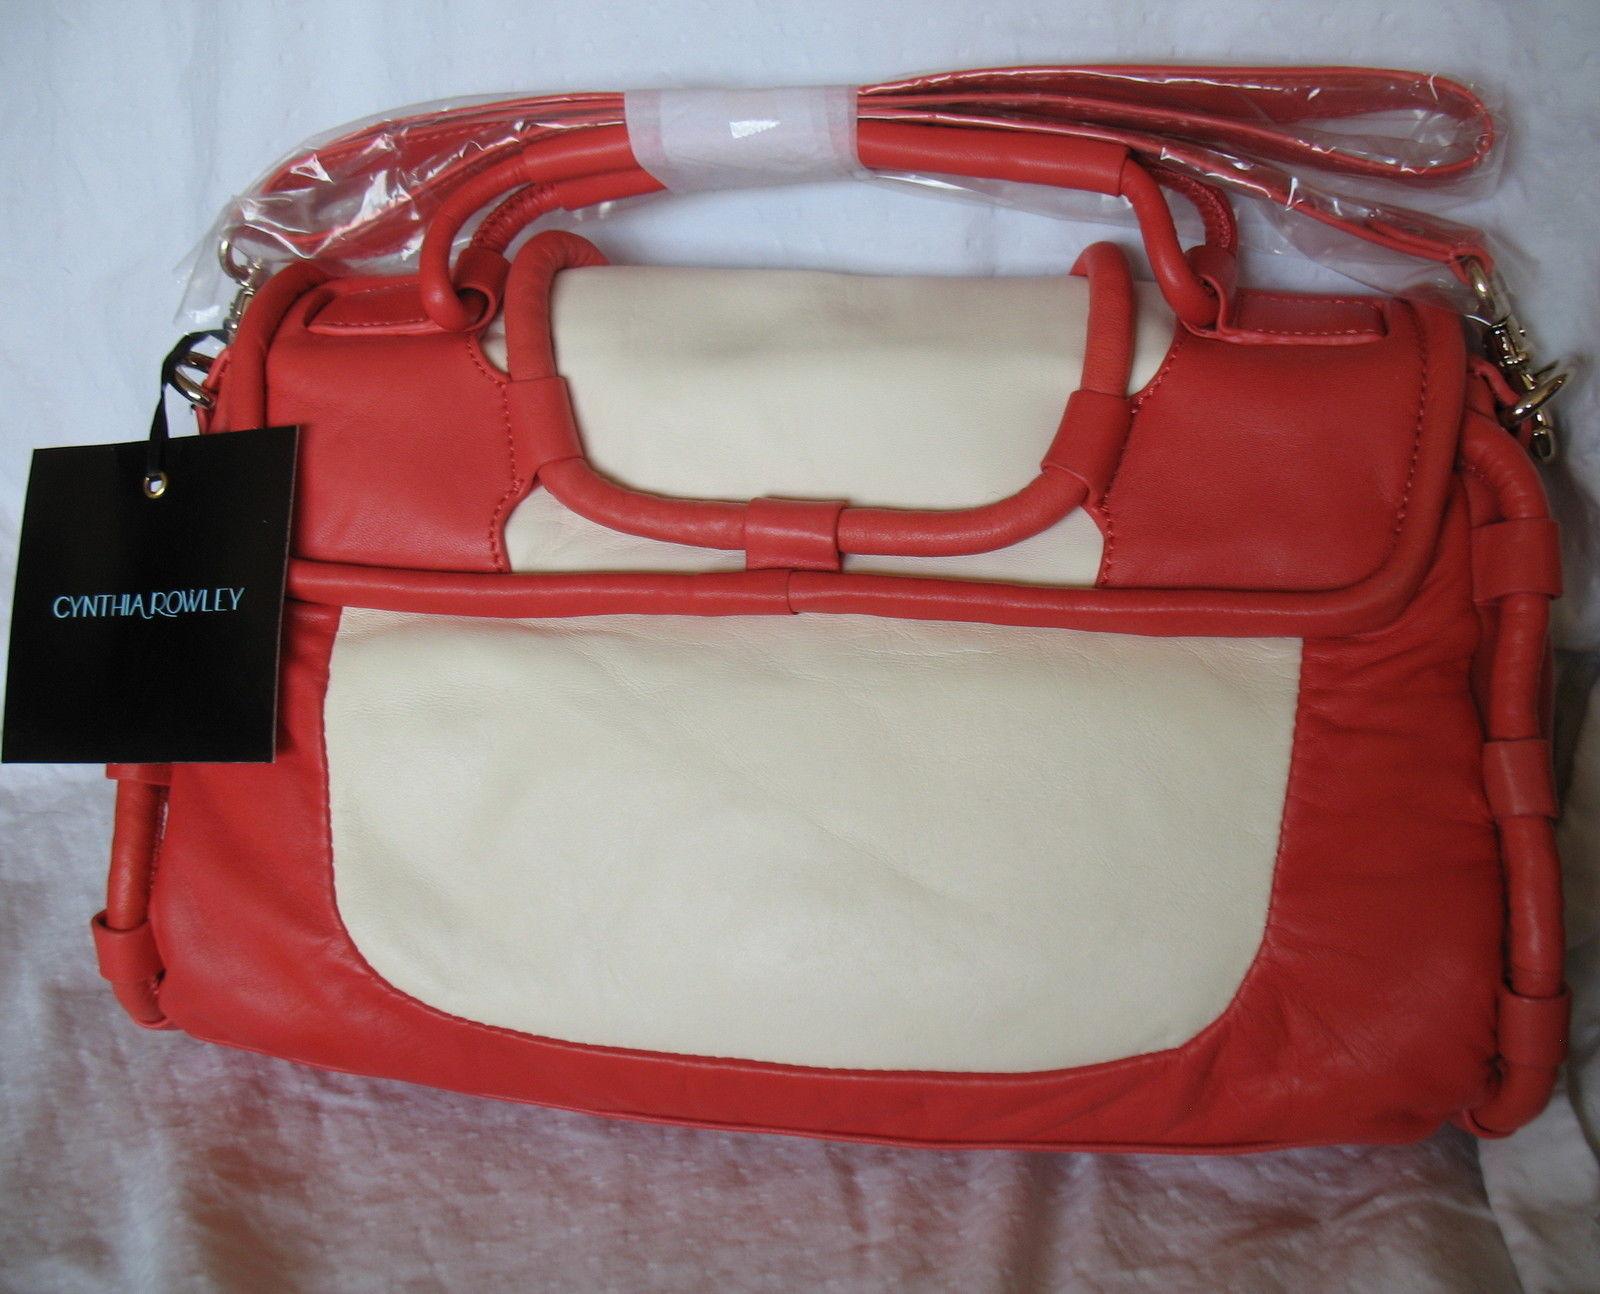 Cynthia Rowley New Purse Handbag Leather Crossbody Calloway Orange Coral White image 2